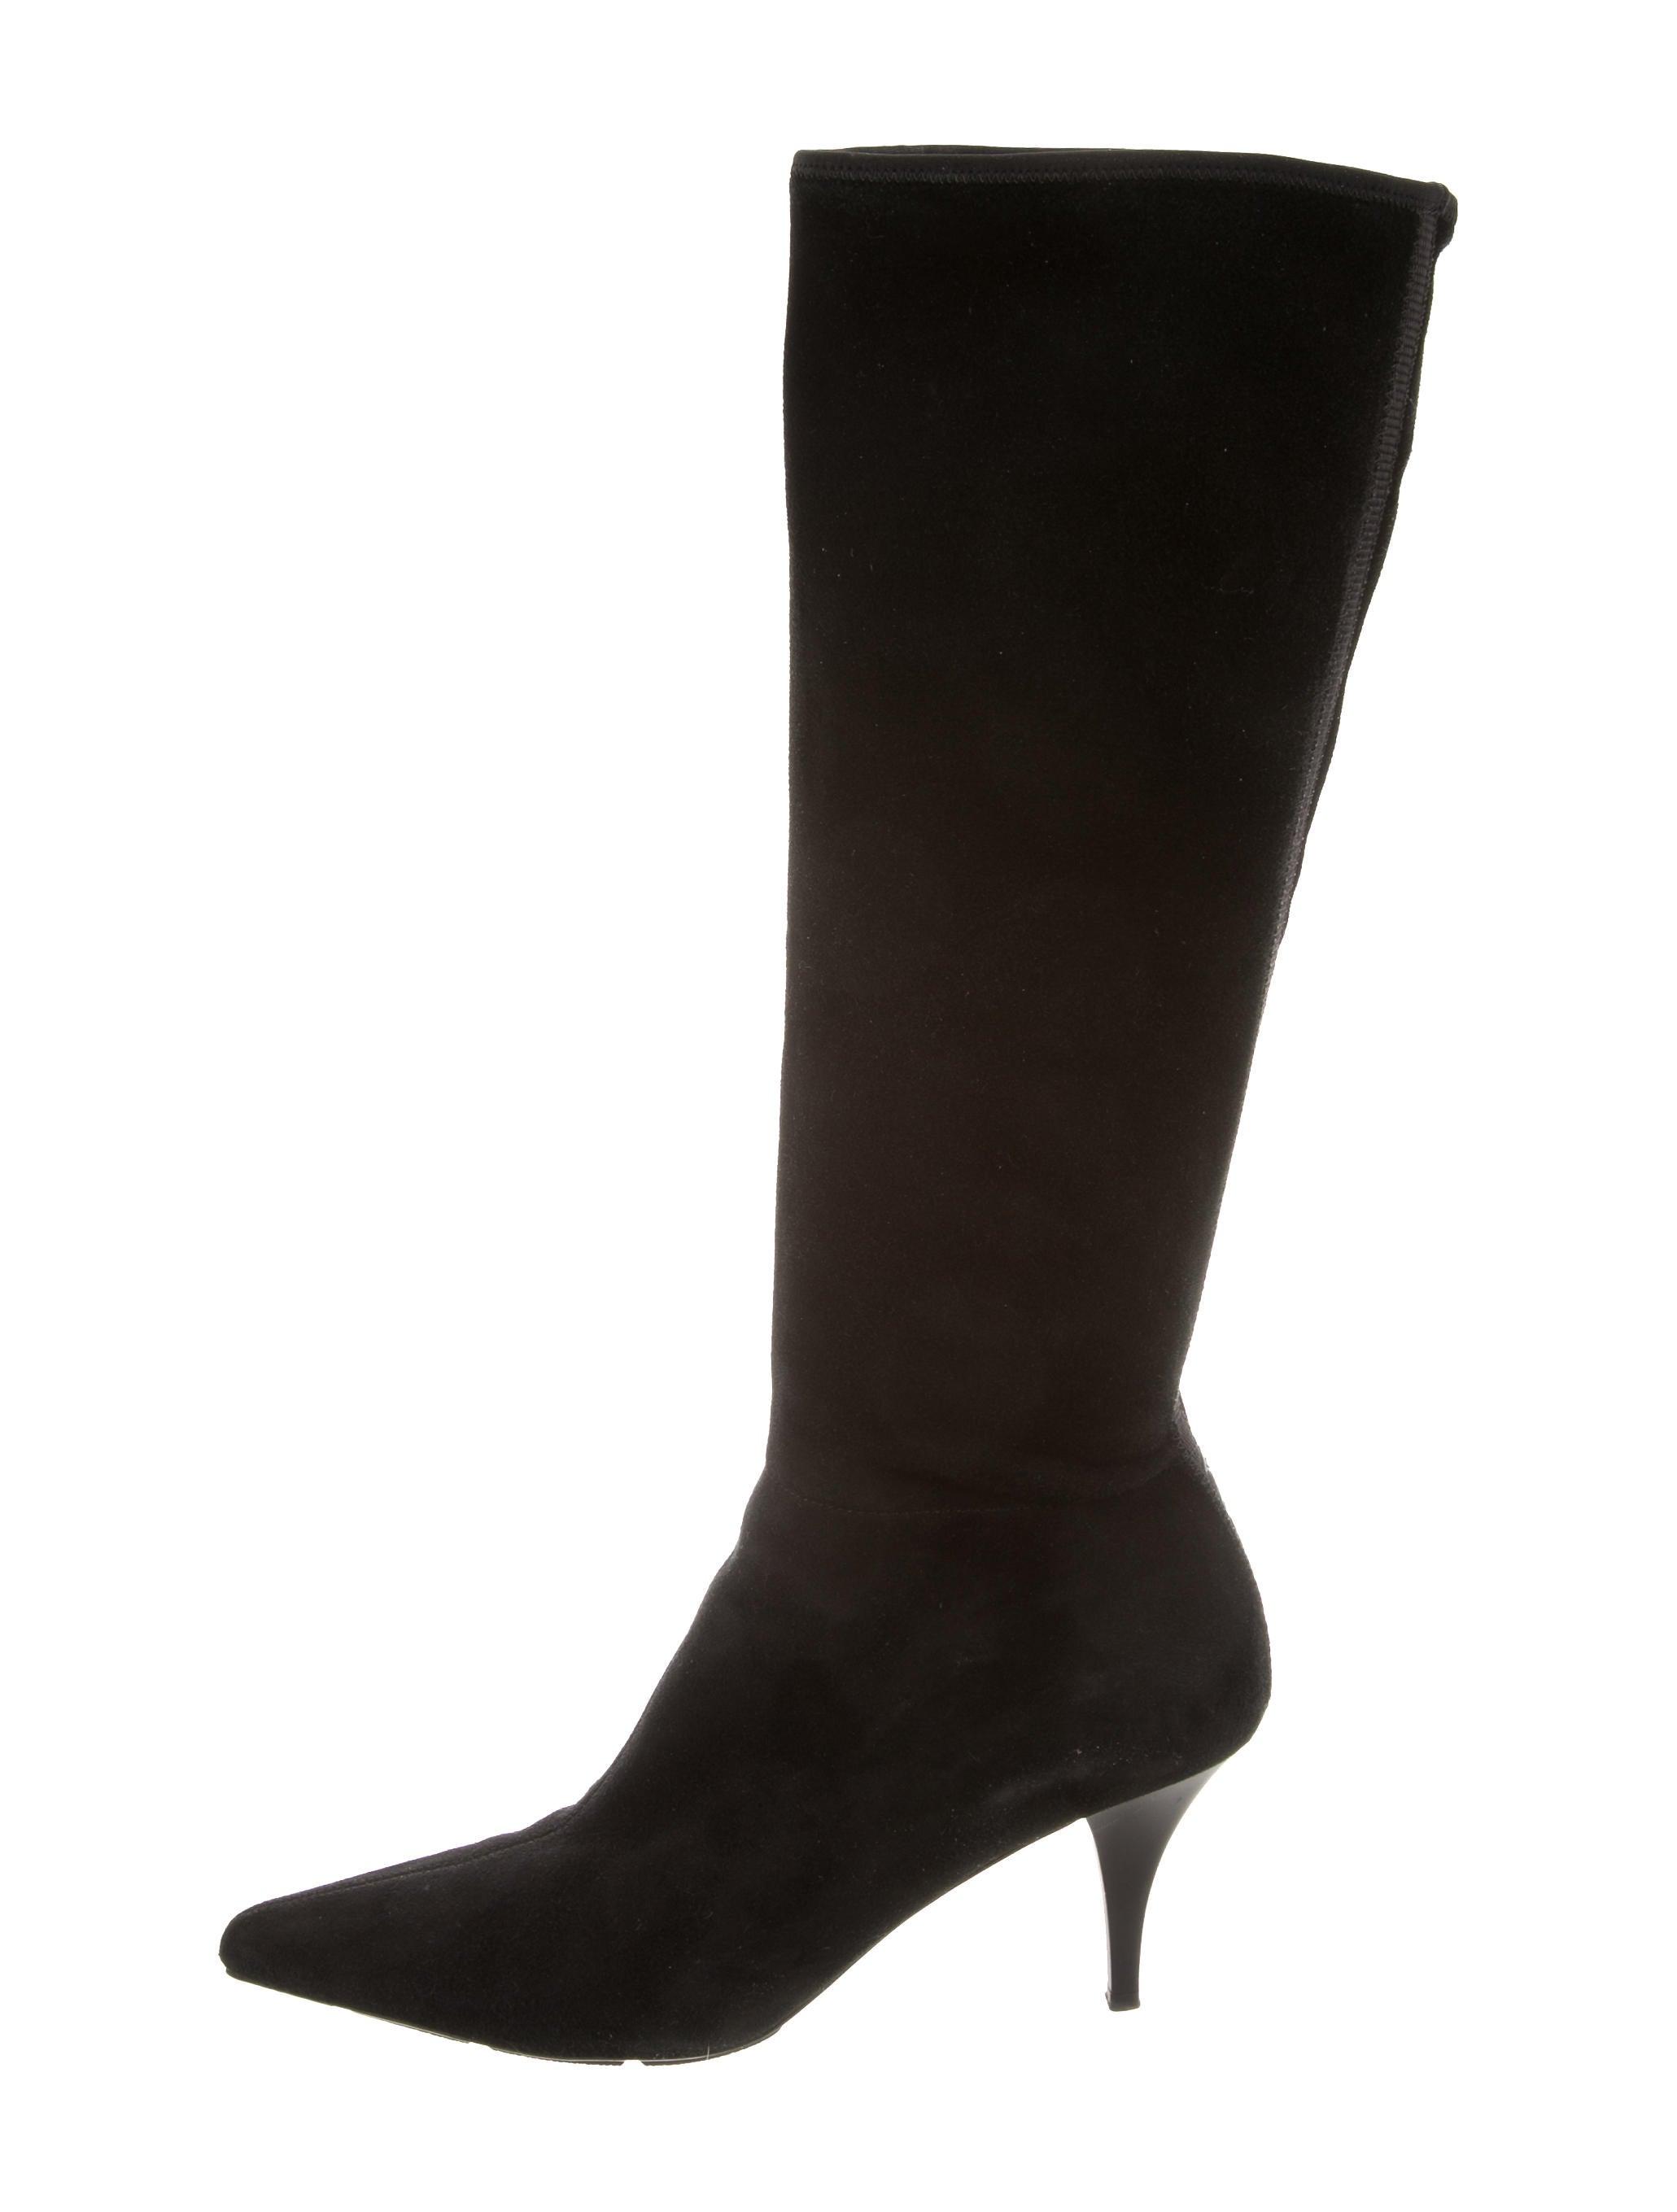 Prada Sport Suede Knee-High Boots really cheap online buy cheap 2014 unisex cheap original fpFNIY0O1a